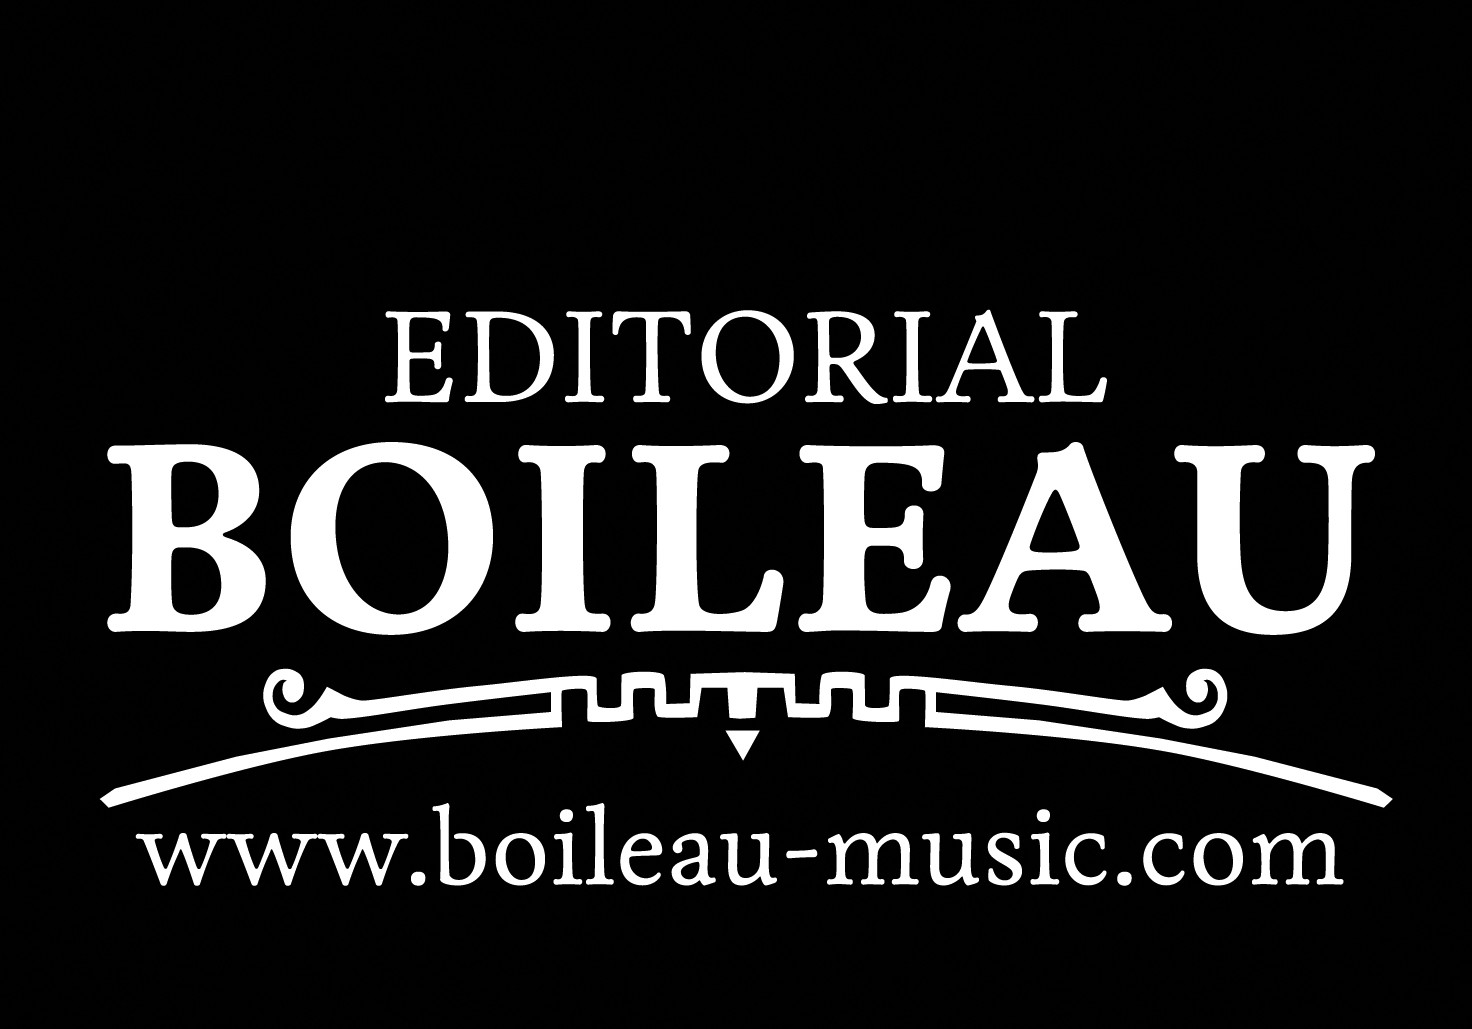 Sounds From Spain - Boileau Editorial de Música S.L.